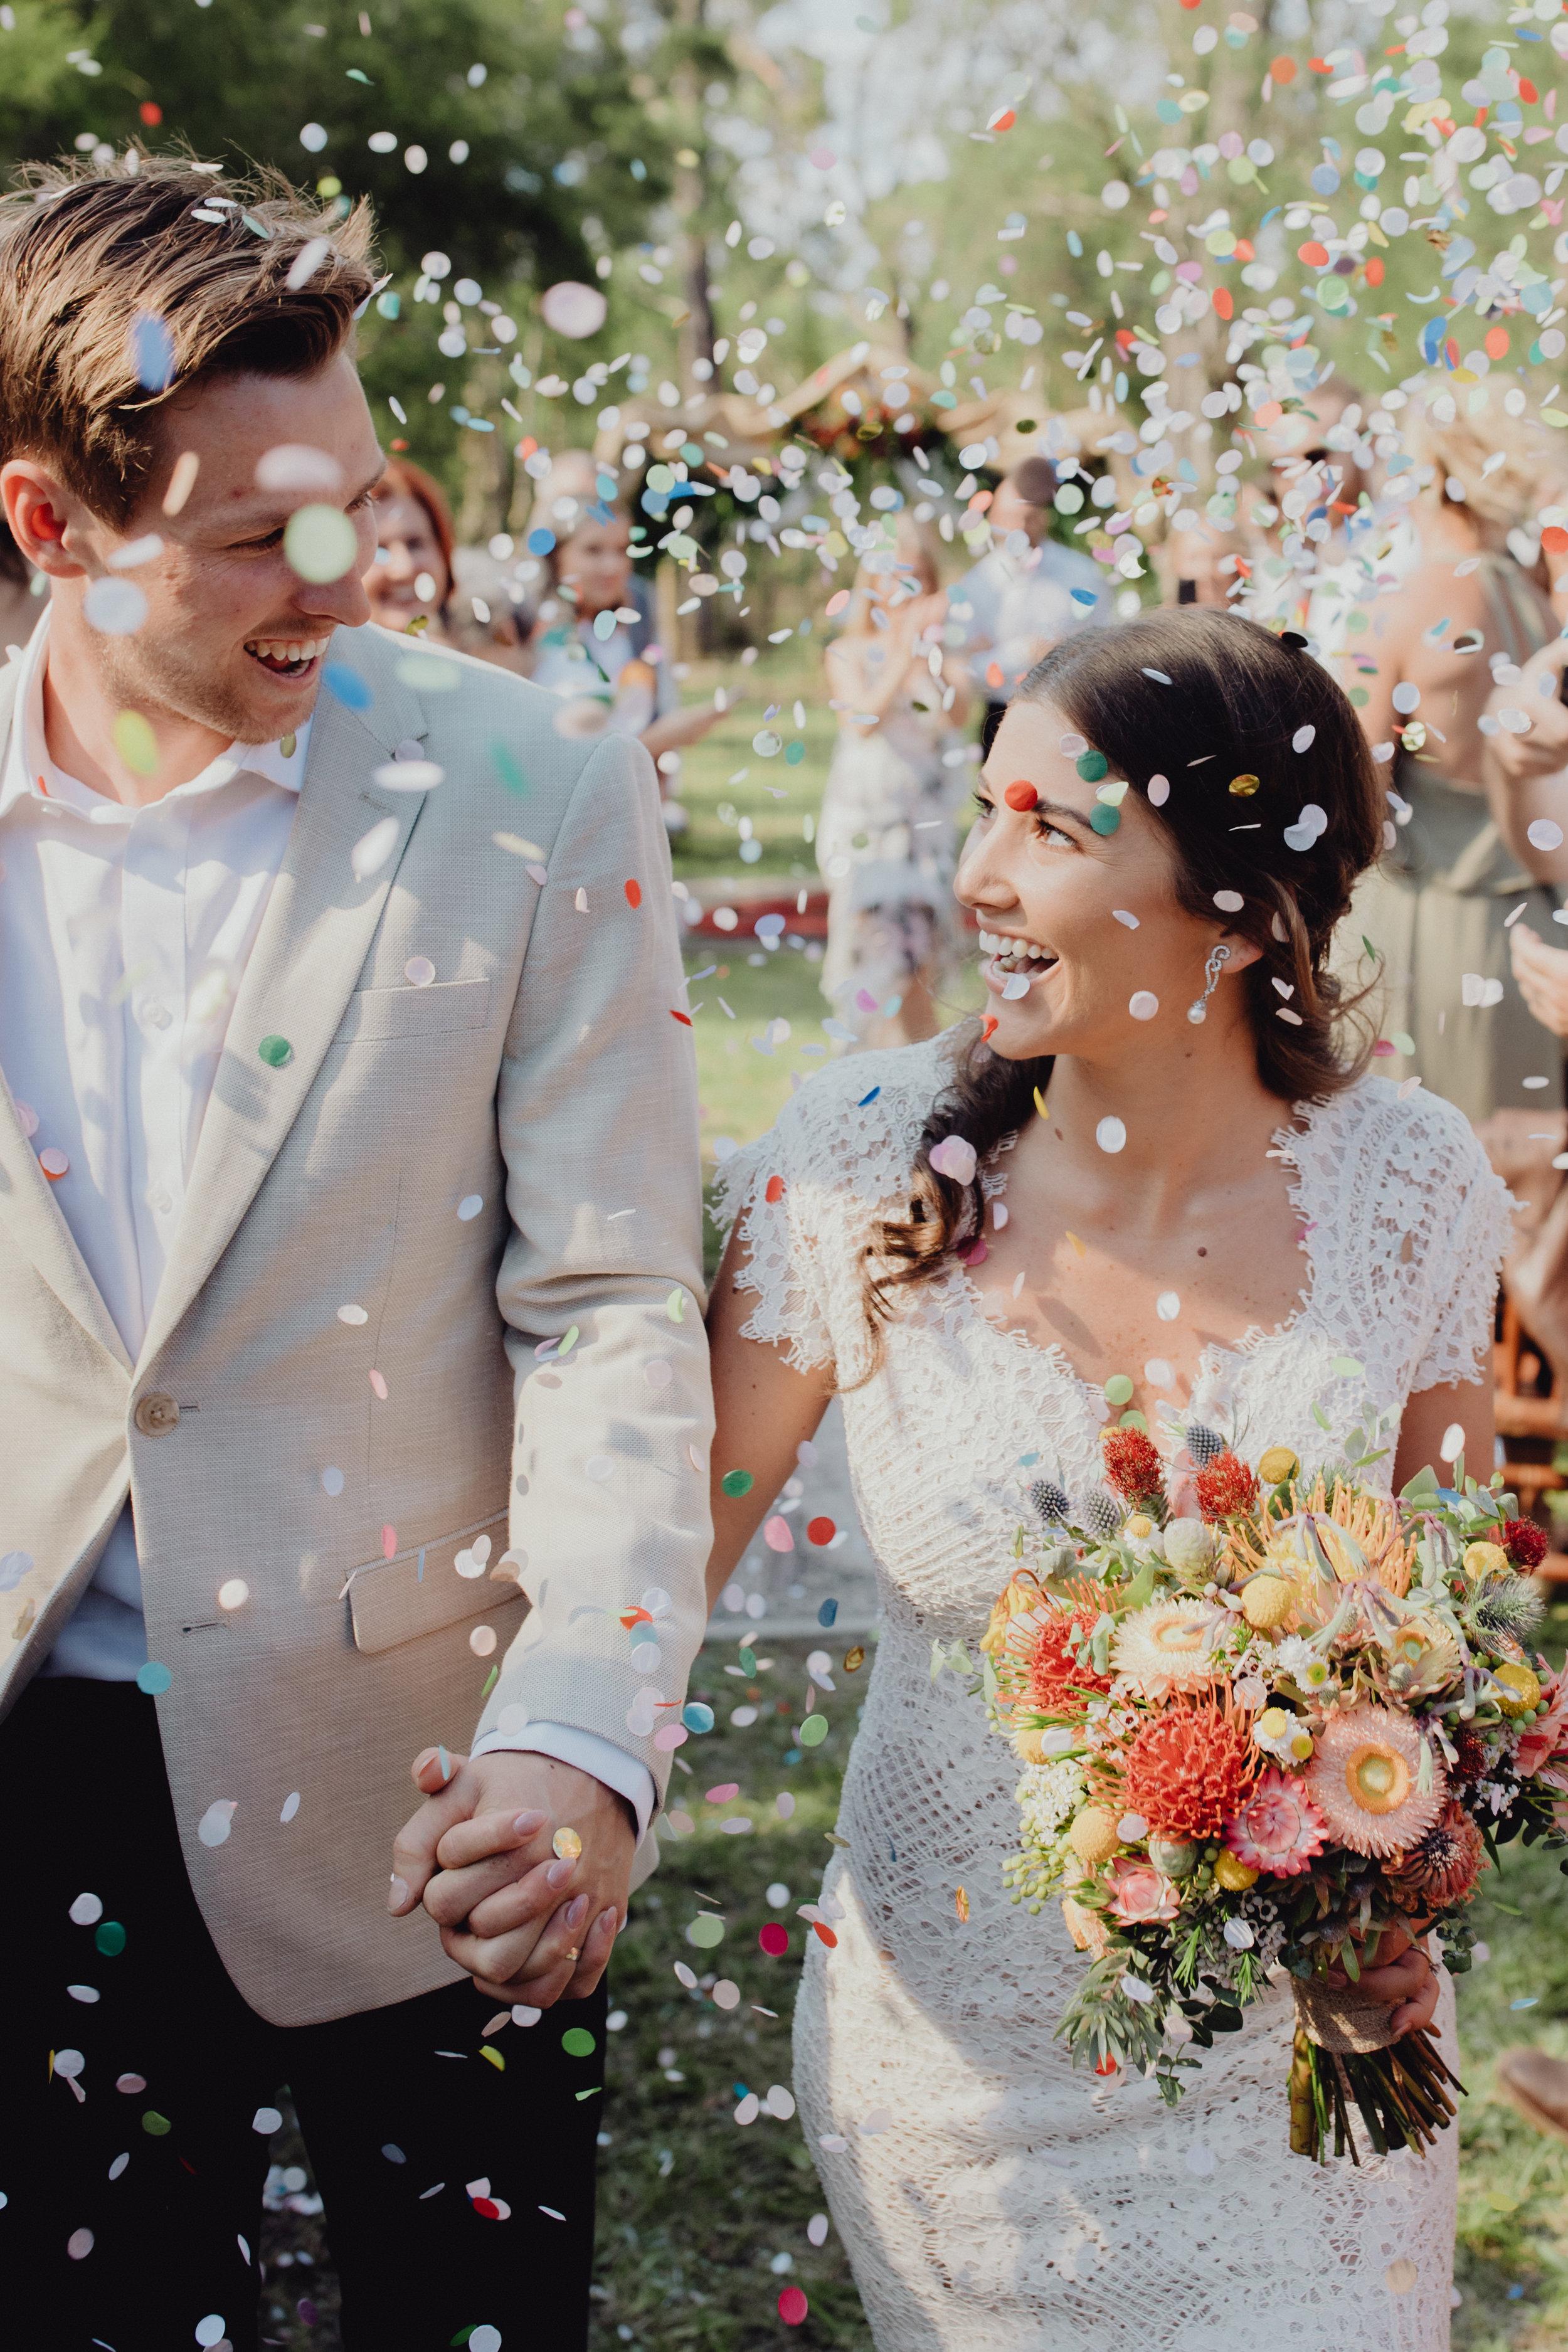 wedding in newcastle city australia hunter valley with best wedding photographer samuel jacob